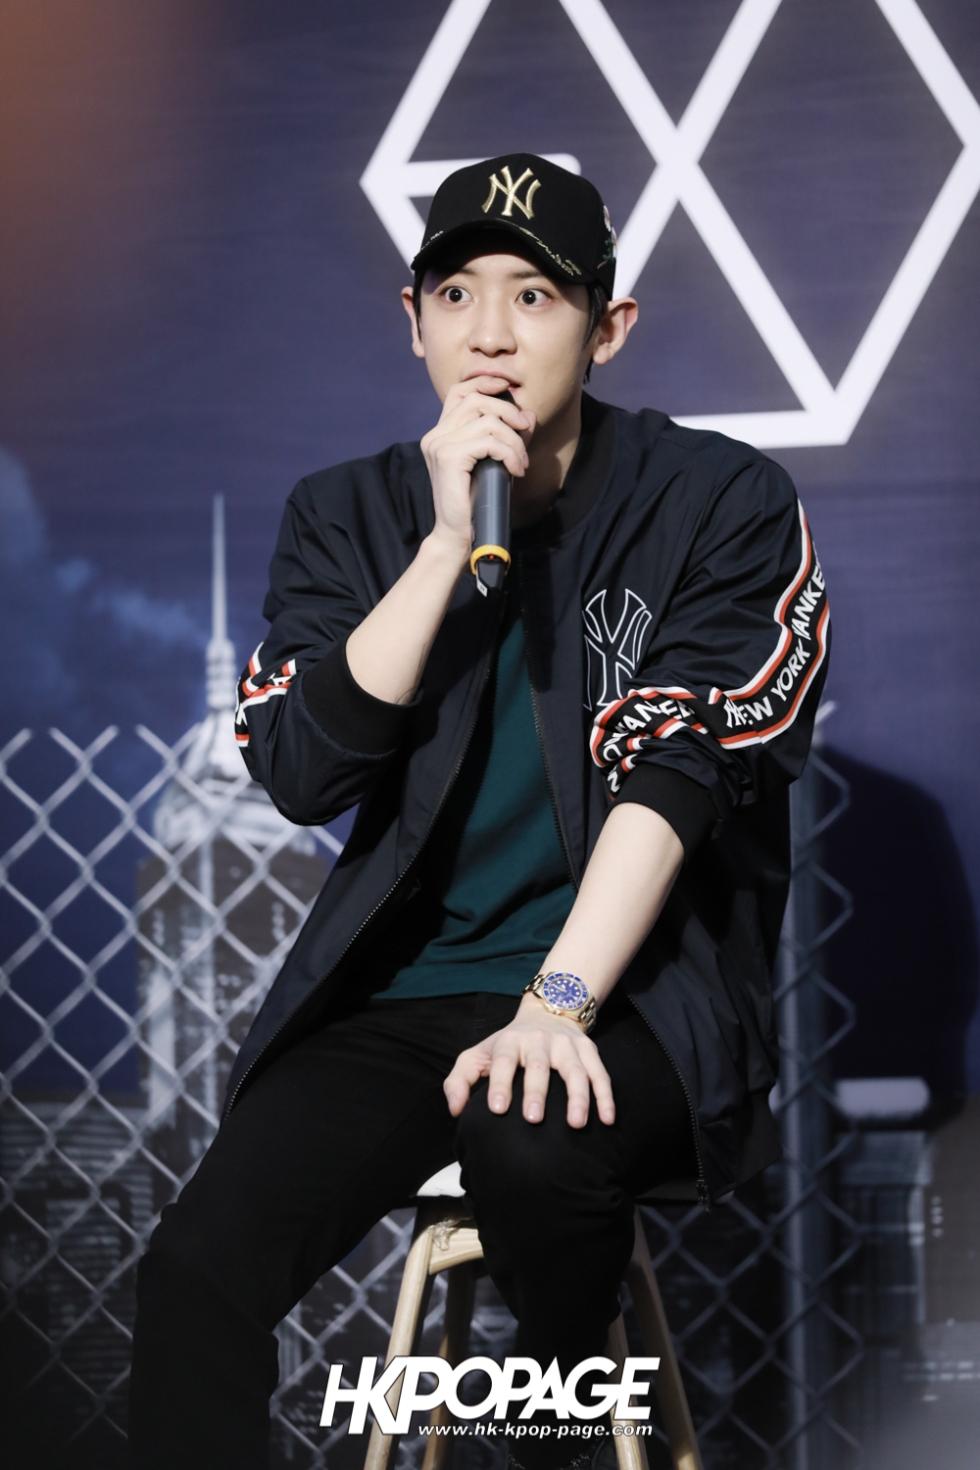 [HK.KPOP.PAGE] 180323_EXO_Chanyeol Kai Sehun_MLB Event_10